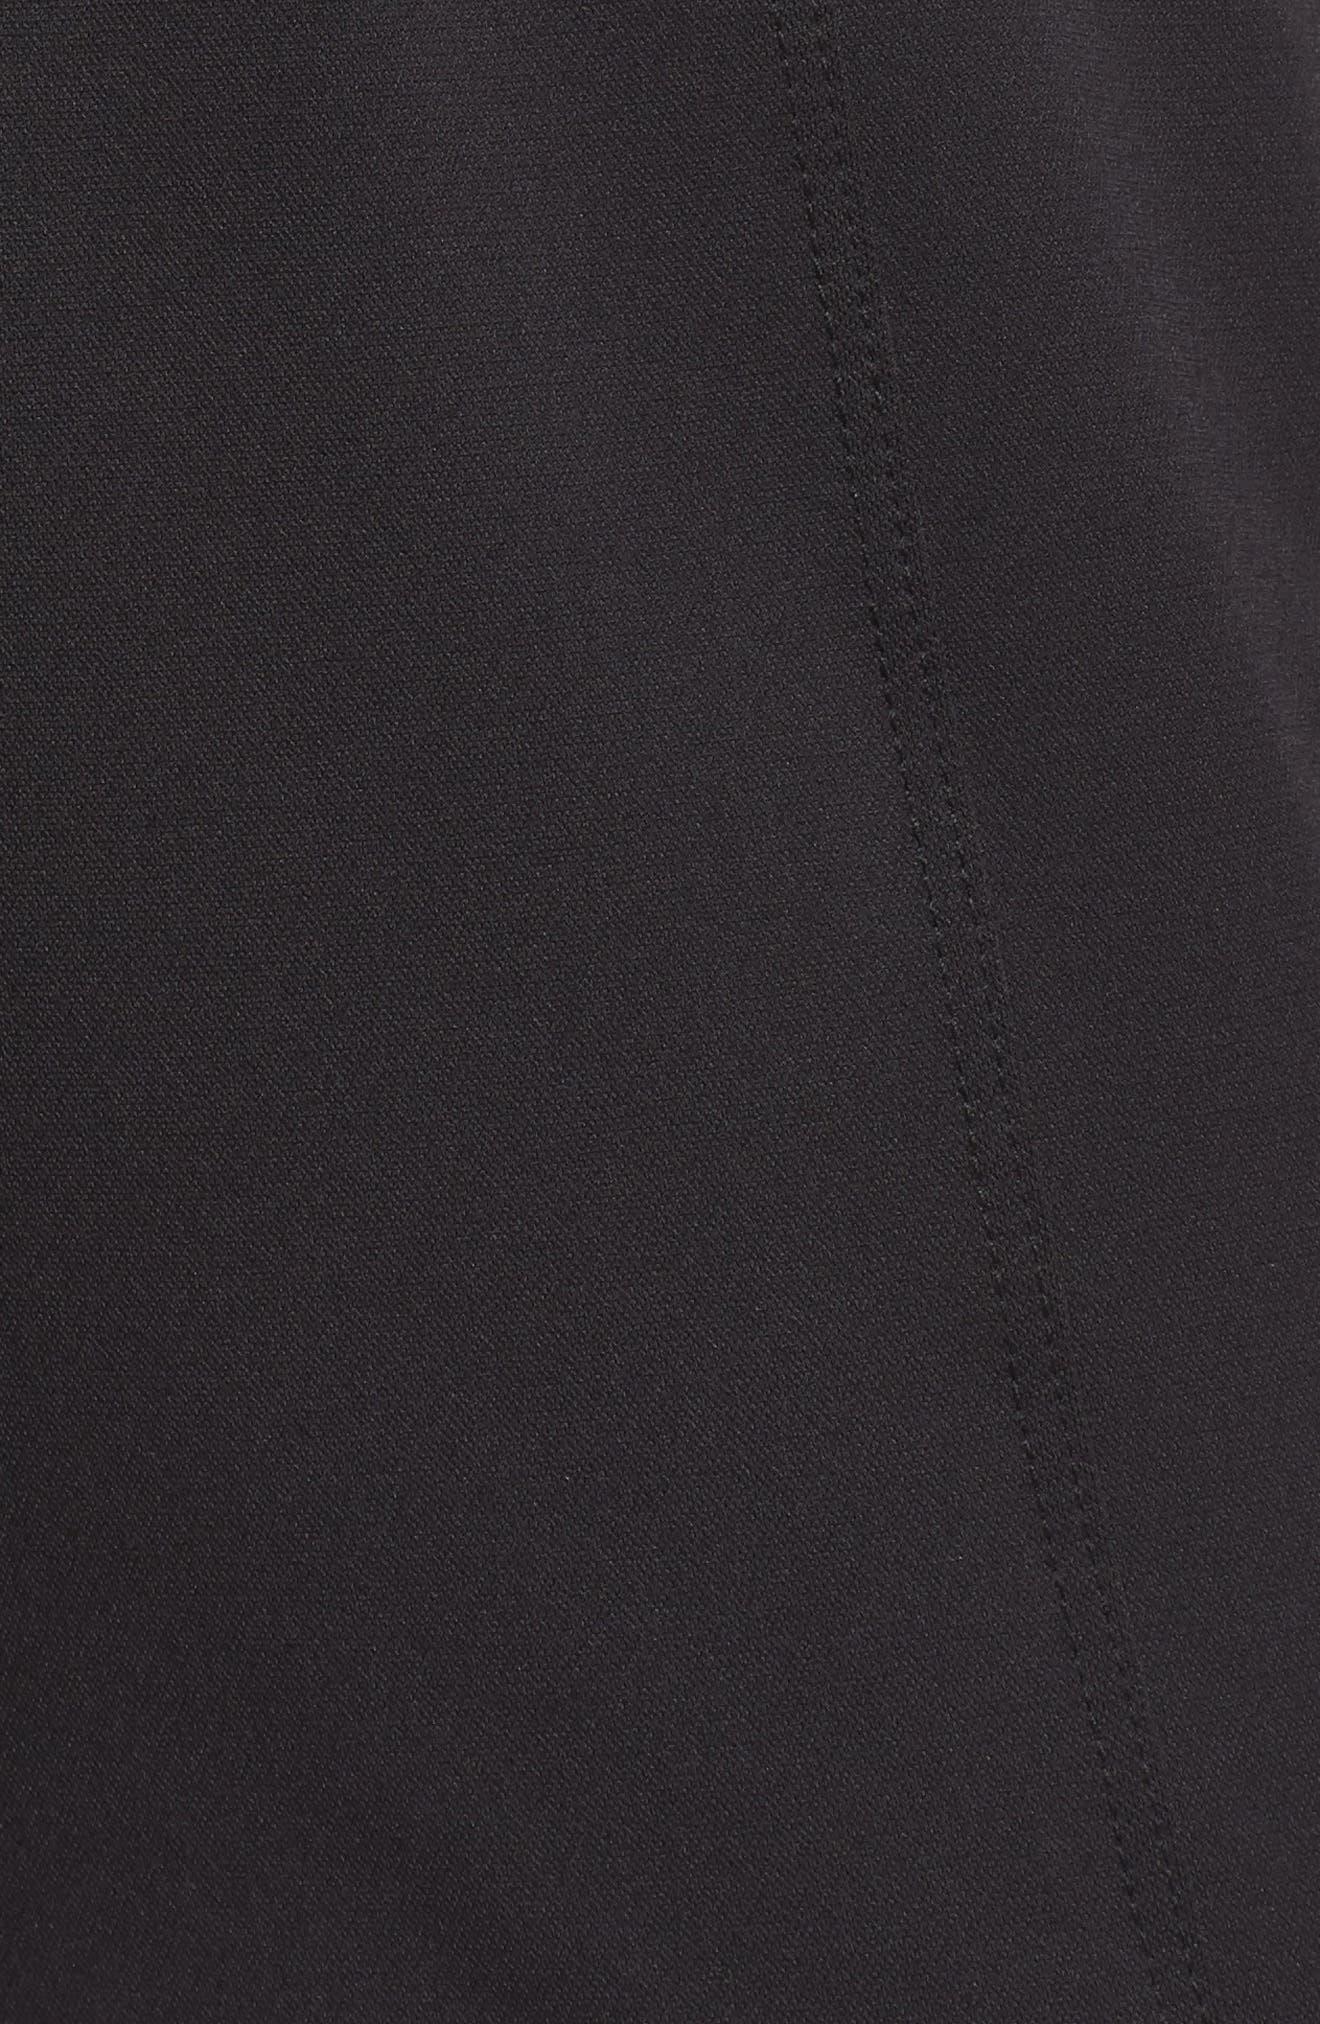 Mica Crop Track Pants,                             Alternate thumbnail 6, color,                             Black